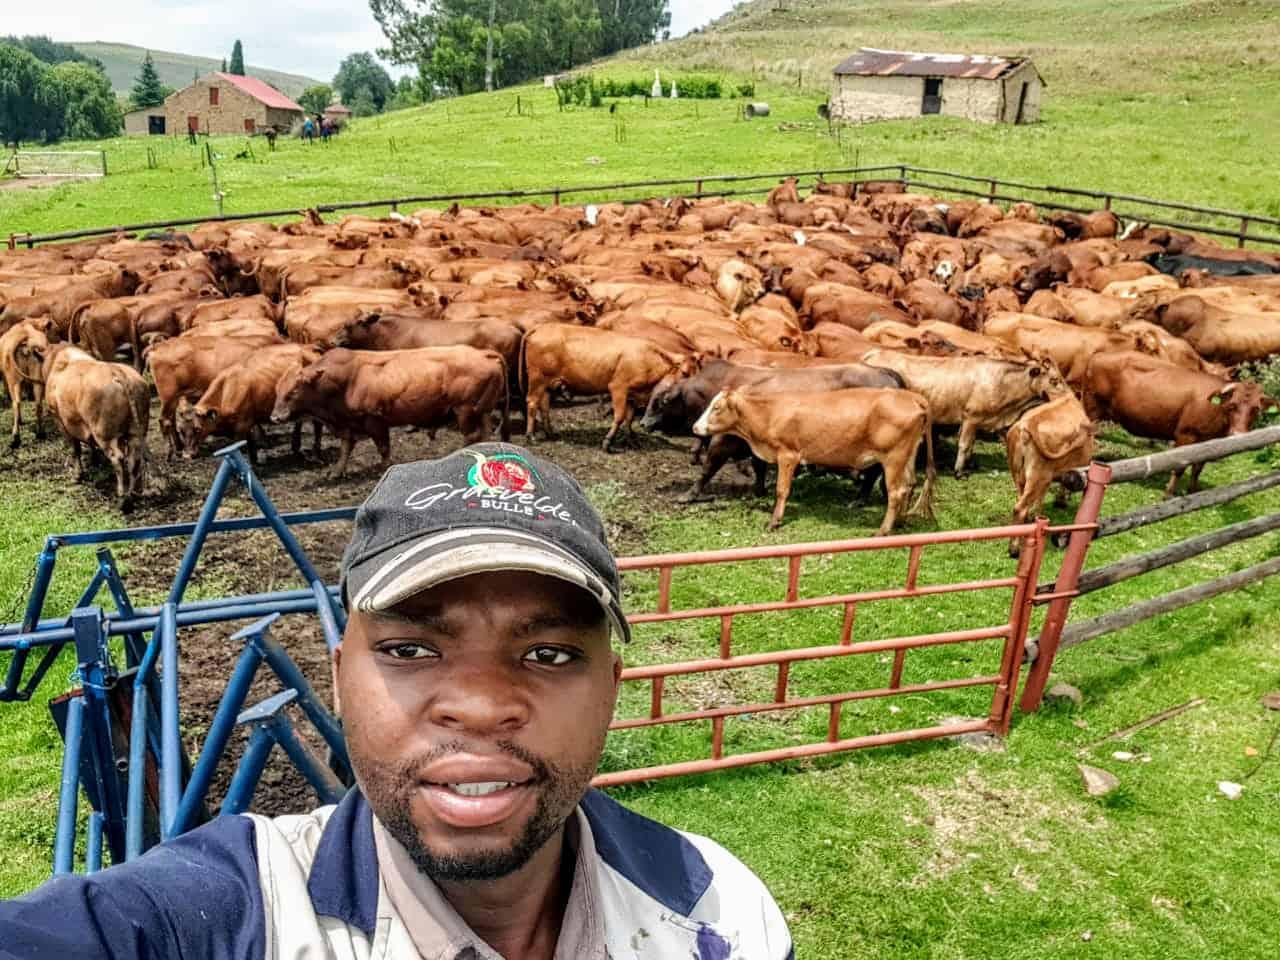 Nsika Shabalala manages the cattle farming department at Afrikan Farms in Mpumalanga.